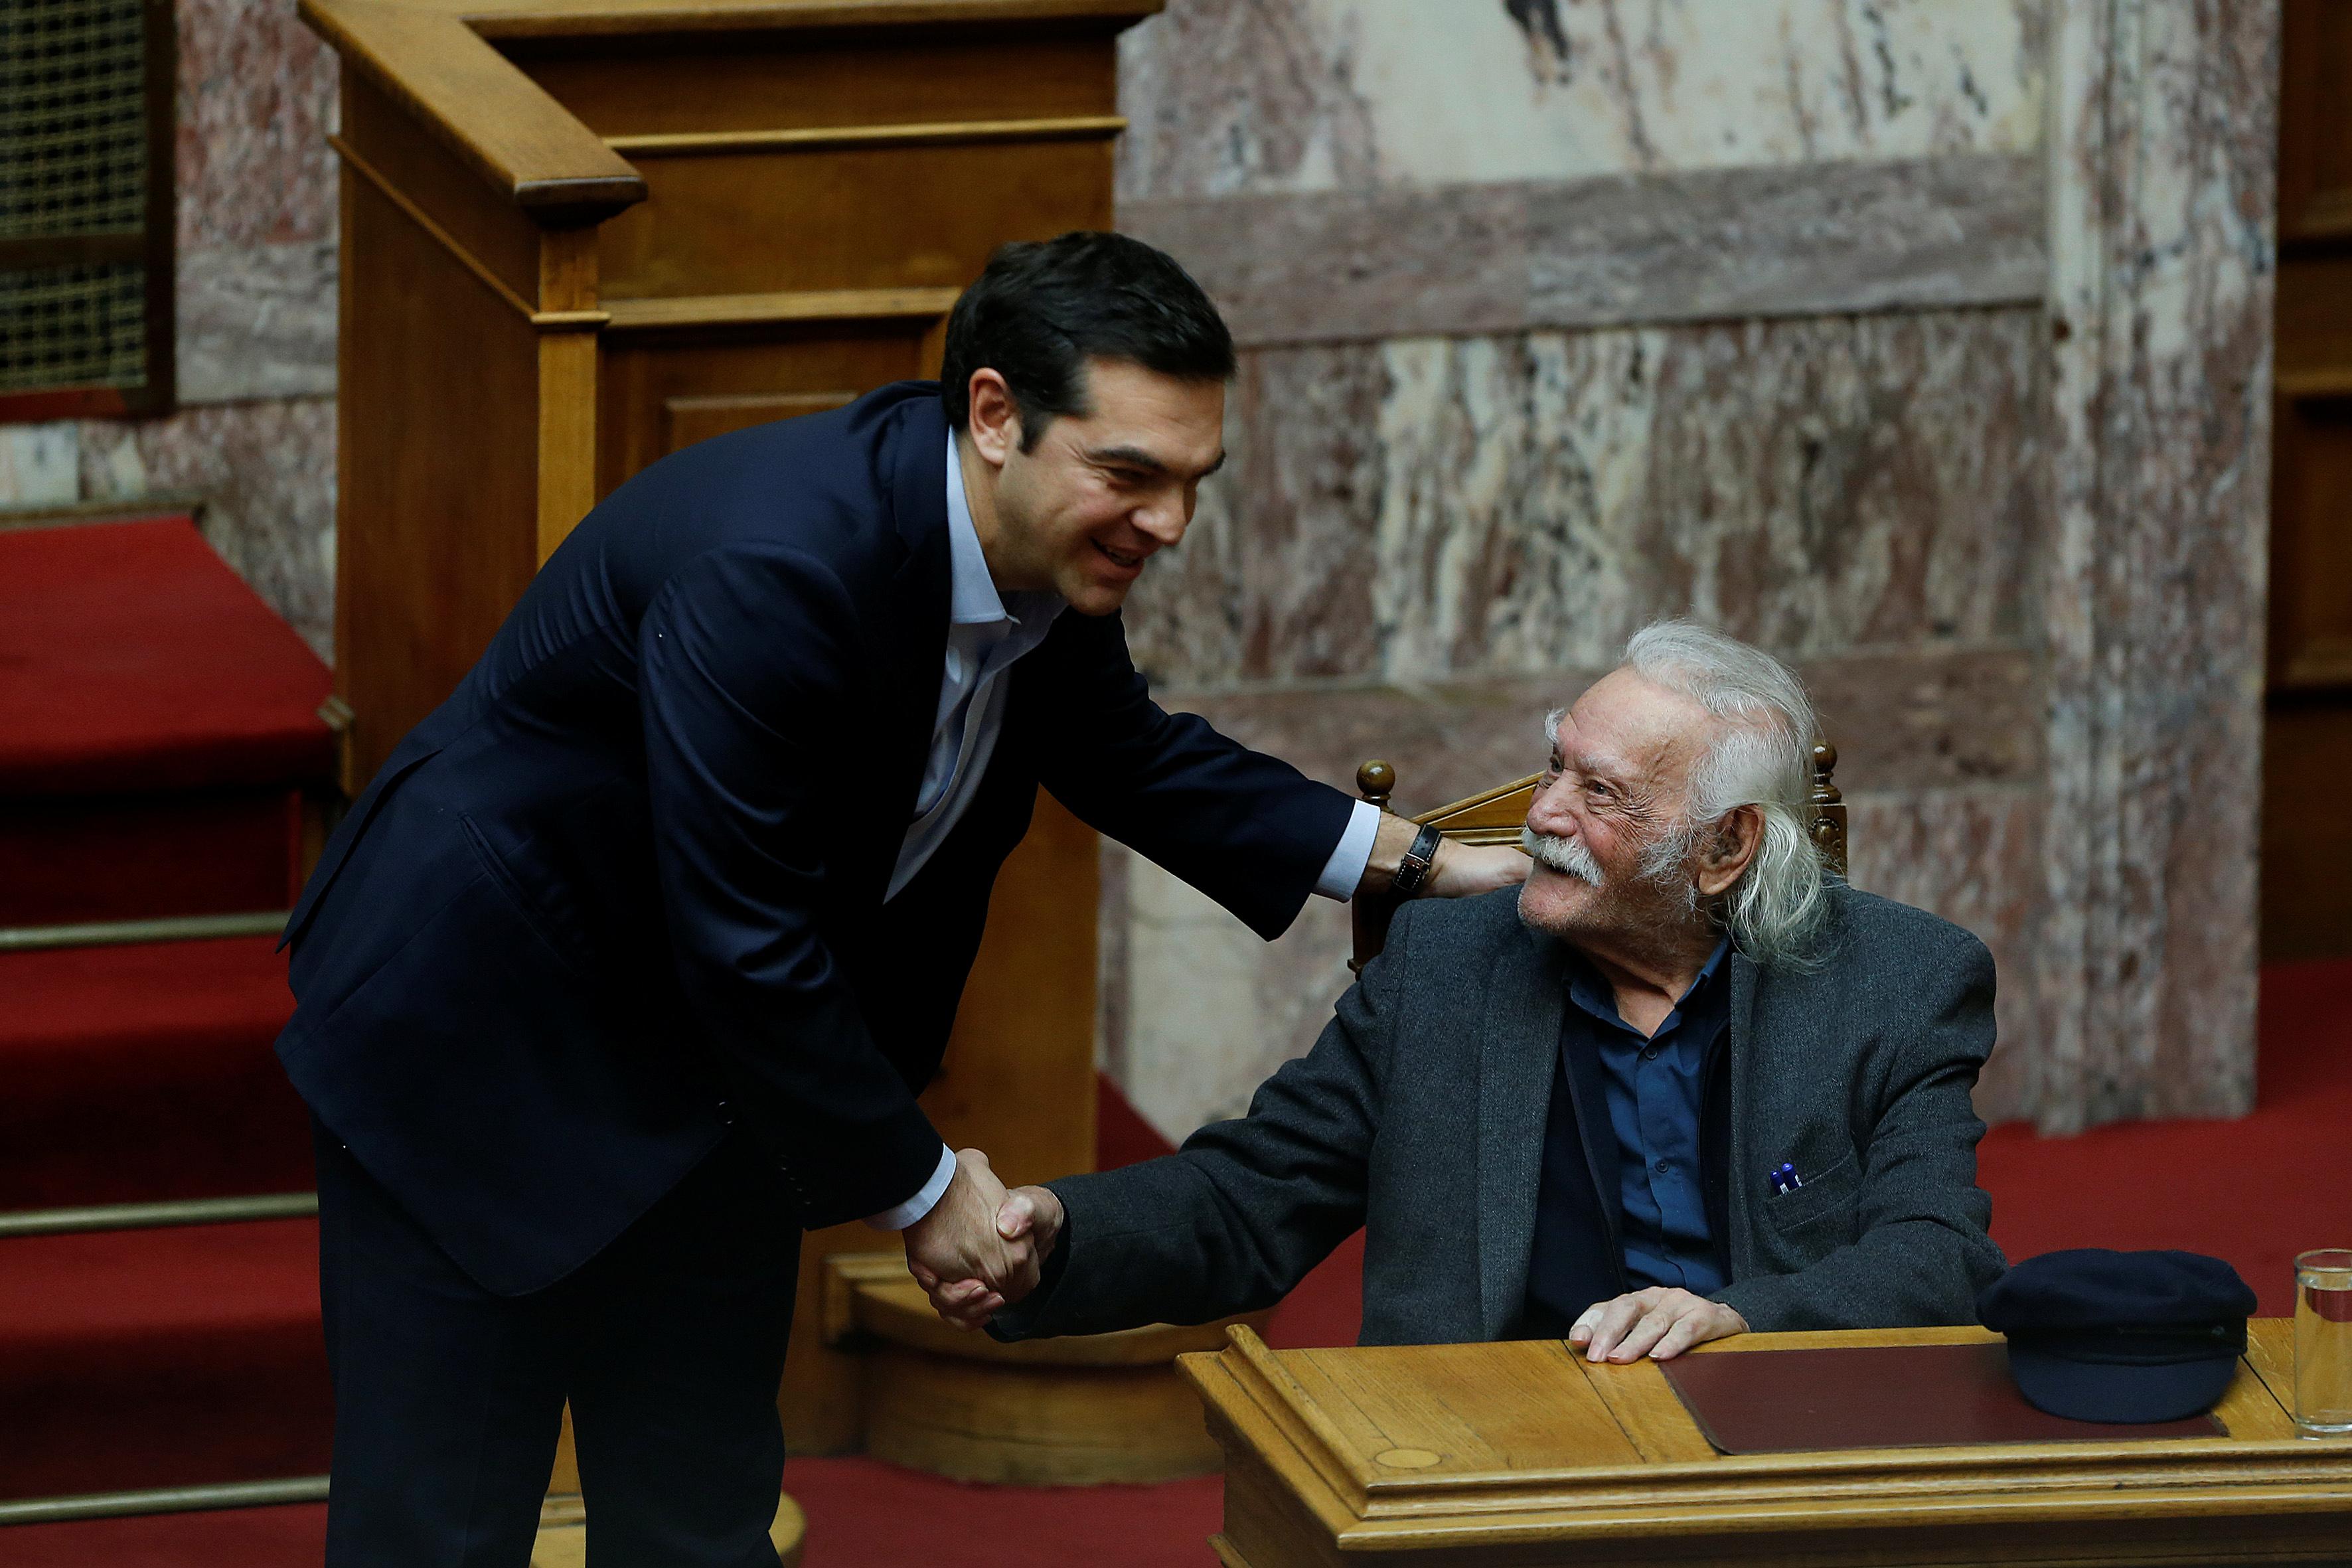 Glezos, Greek who tore swastika from Acropolis in WW2, dies aged 97